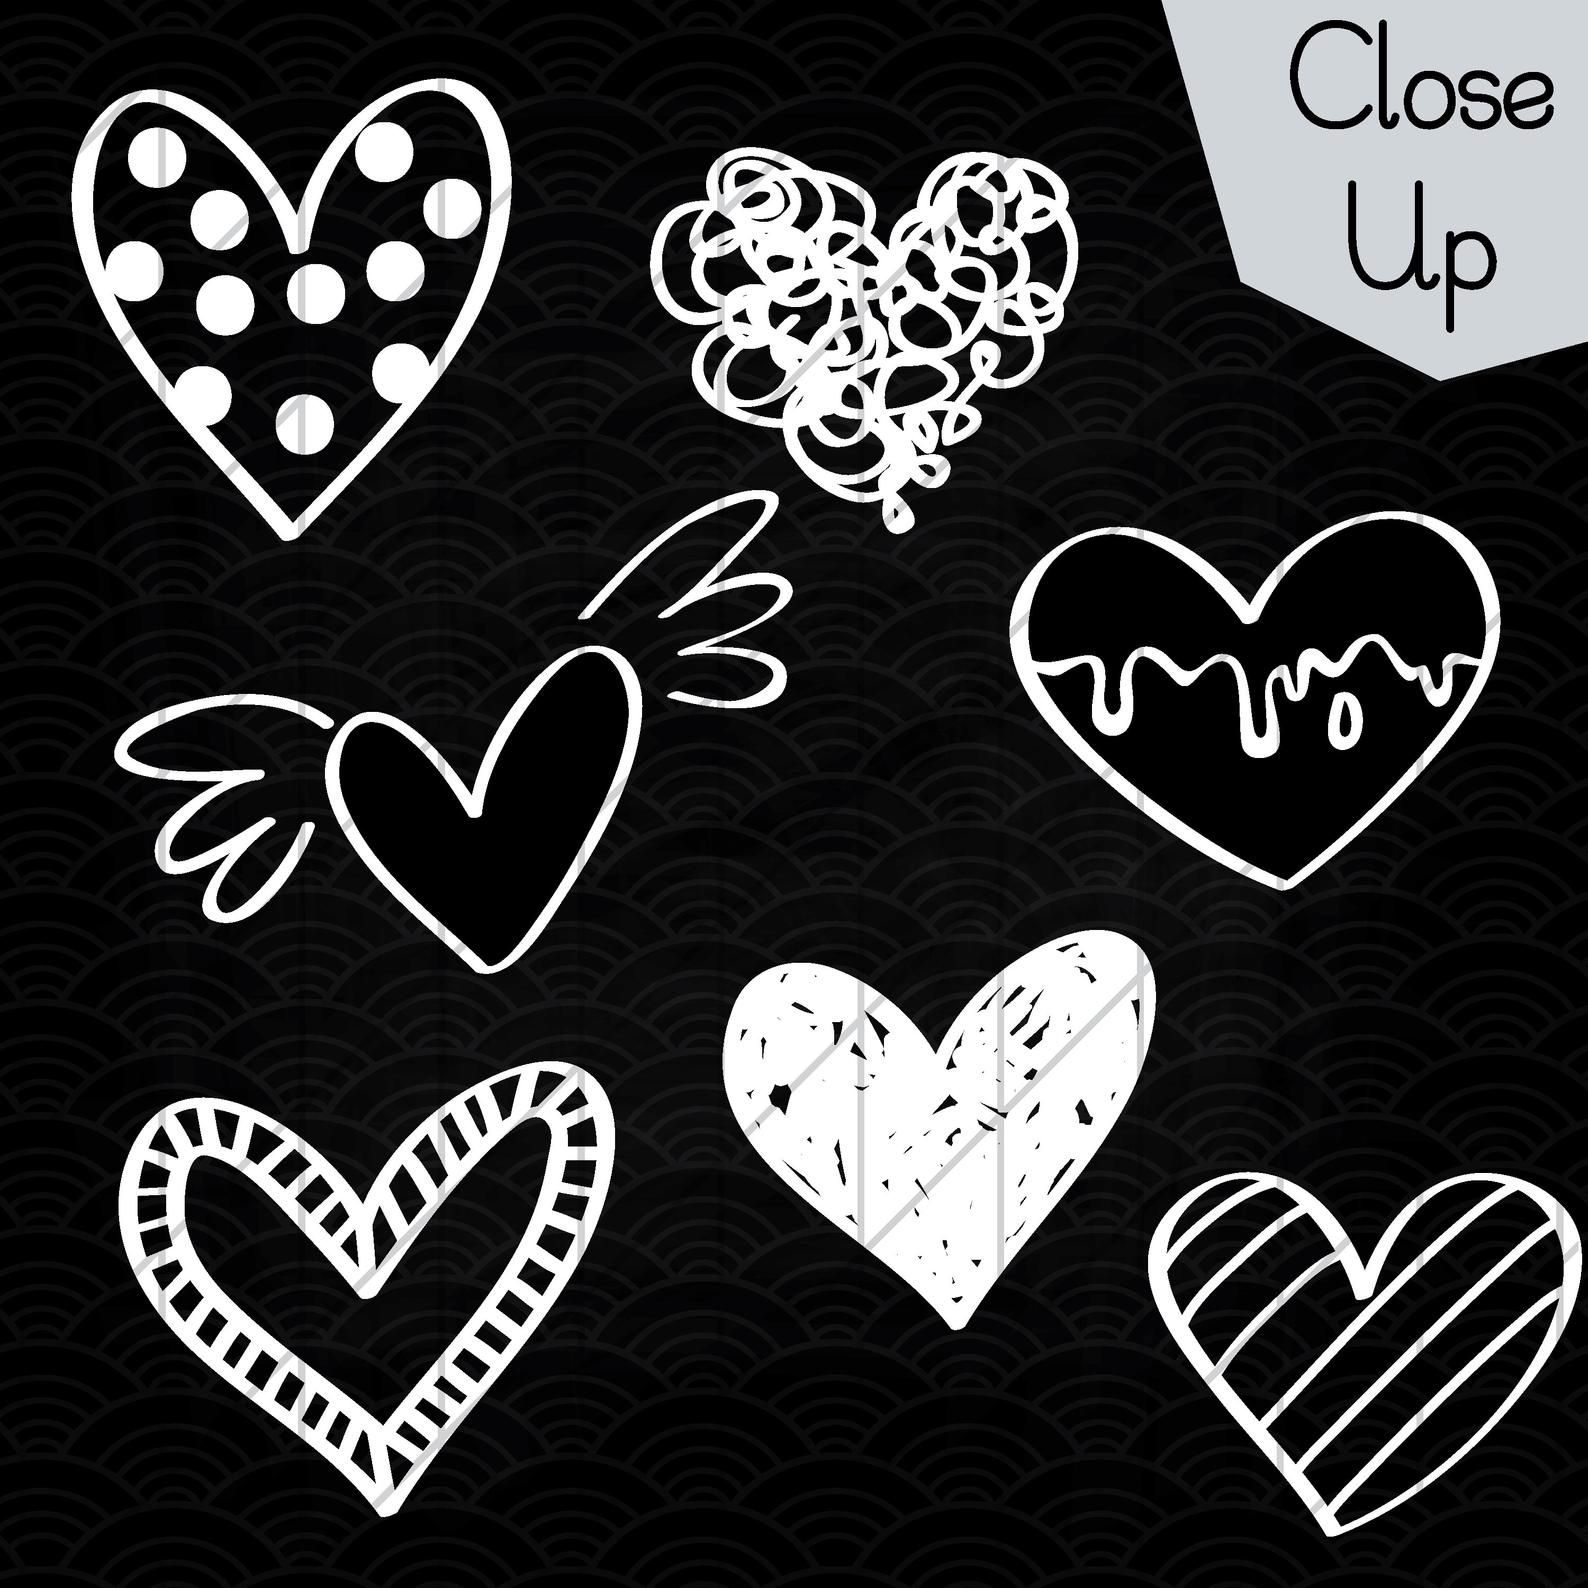 52 White Hearts Outline Clip Art Hand Drawn Romance Vector